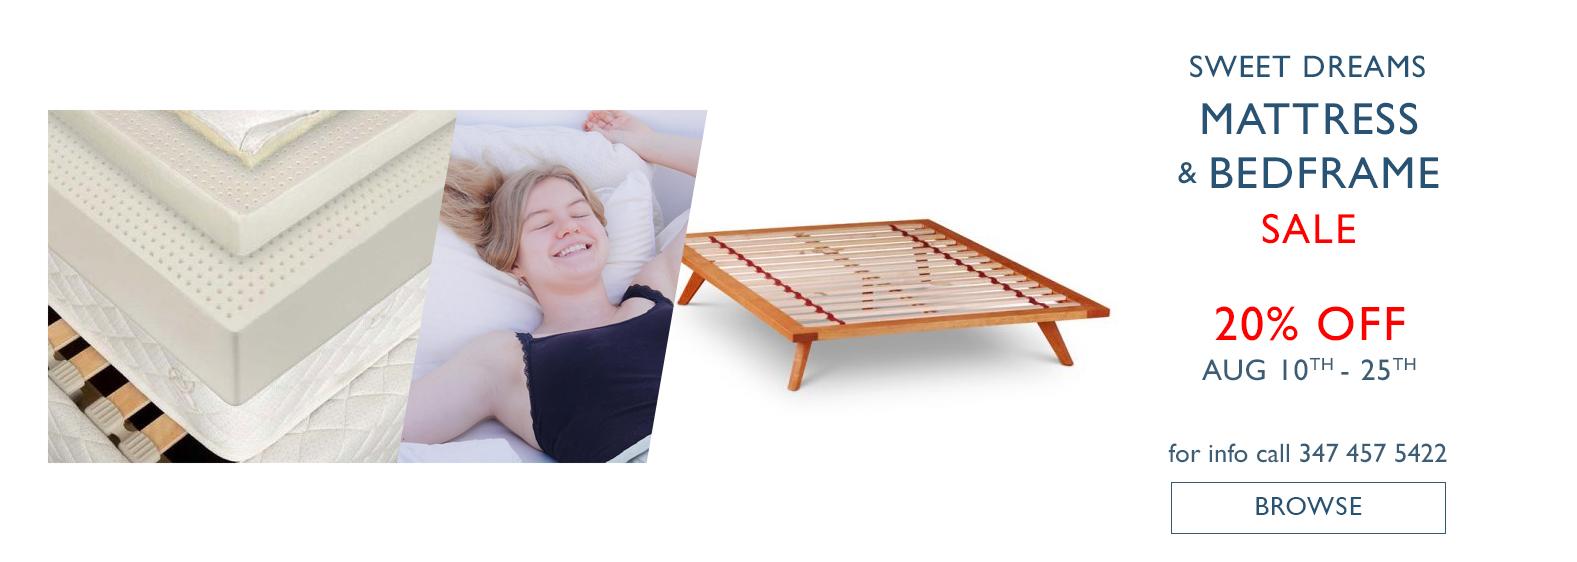 Mattress Bed frame sale Aug 2020